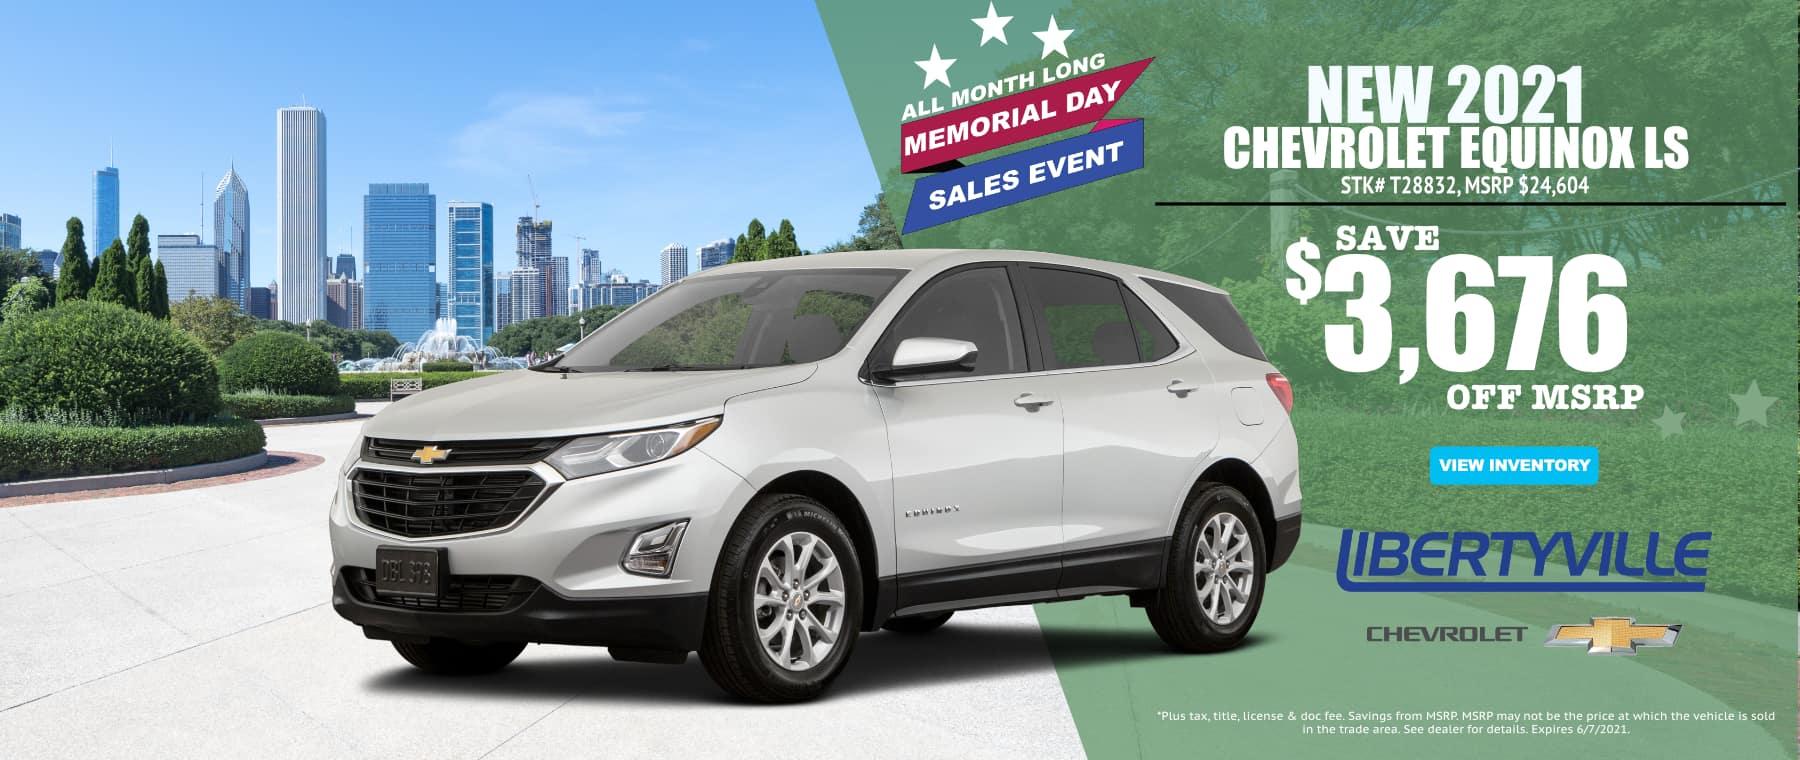 May_2021_Equinox_Chevrolet